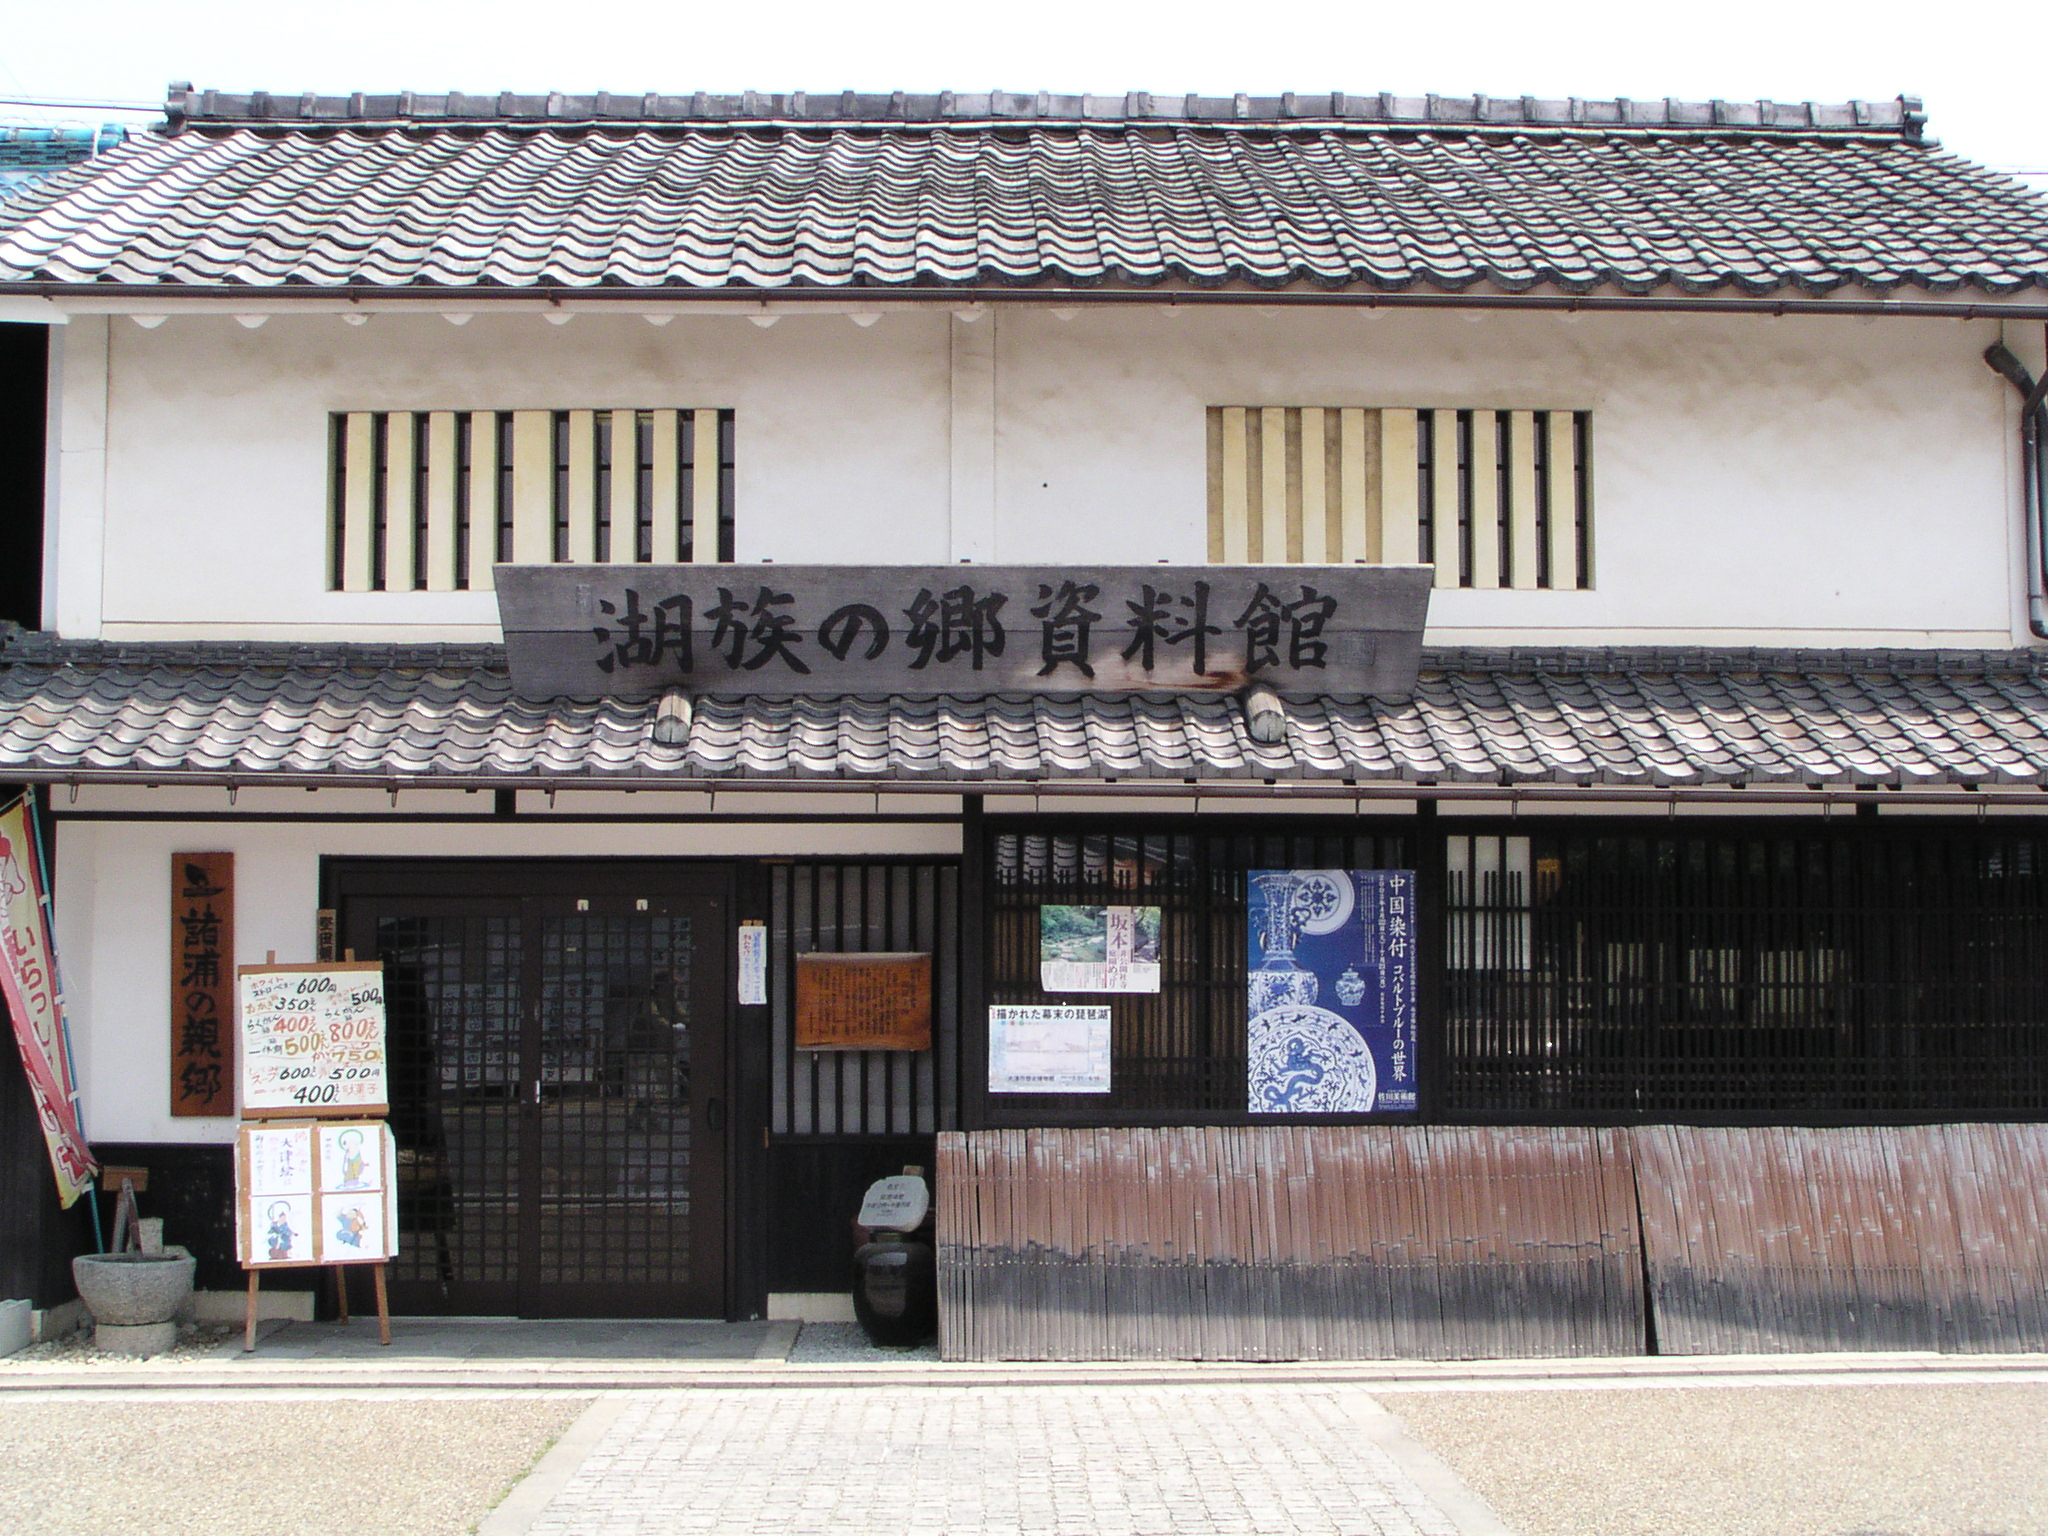 http://www.sagawa-artmuseum.or.jp/blog/%E8%B6%A3%E3%81%AE%E3%81%82%E3%82%8B%E3%81%9F%E3%81%9F%E3%81%9A%E3%81%BE%E3%81%84.jpg